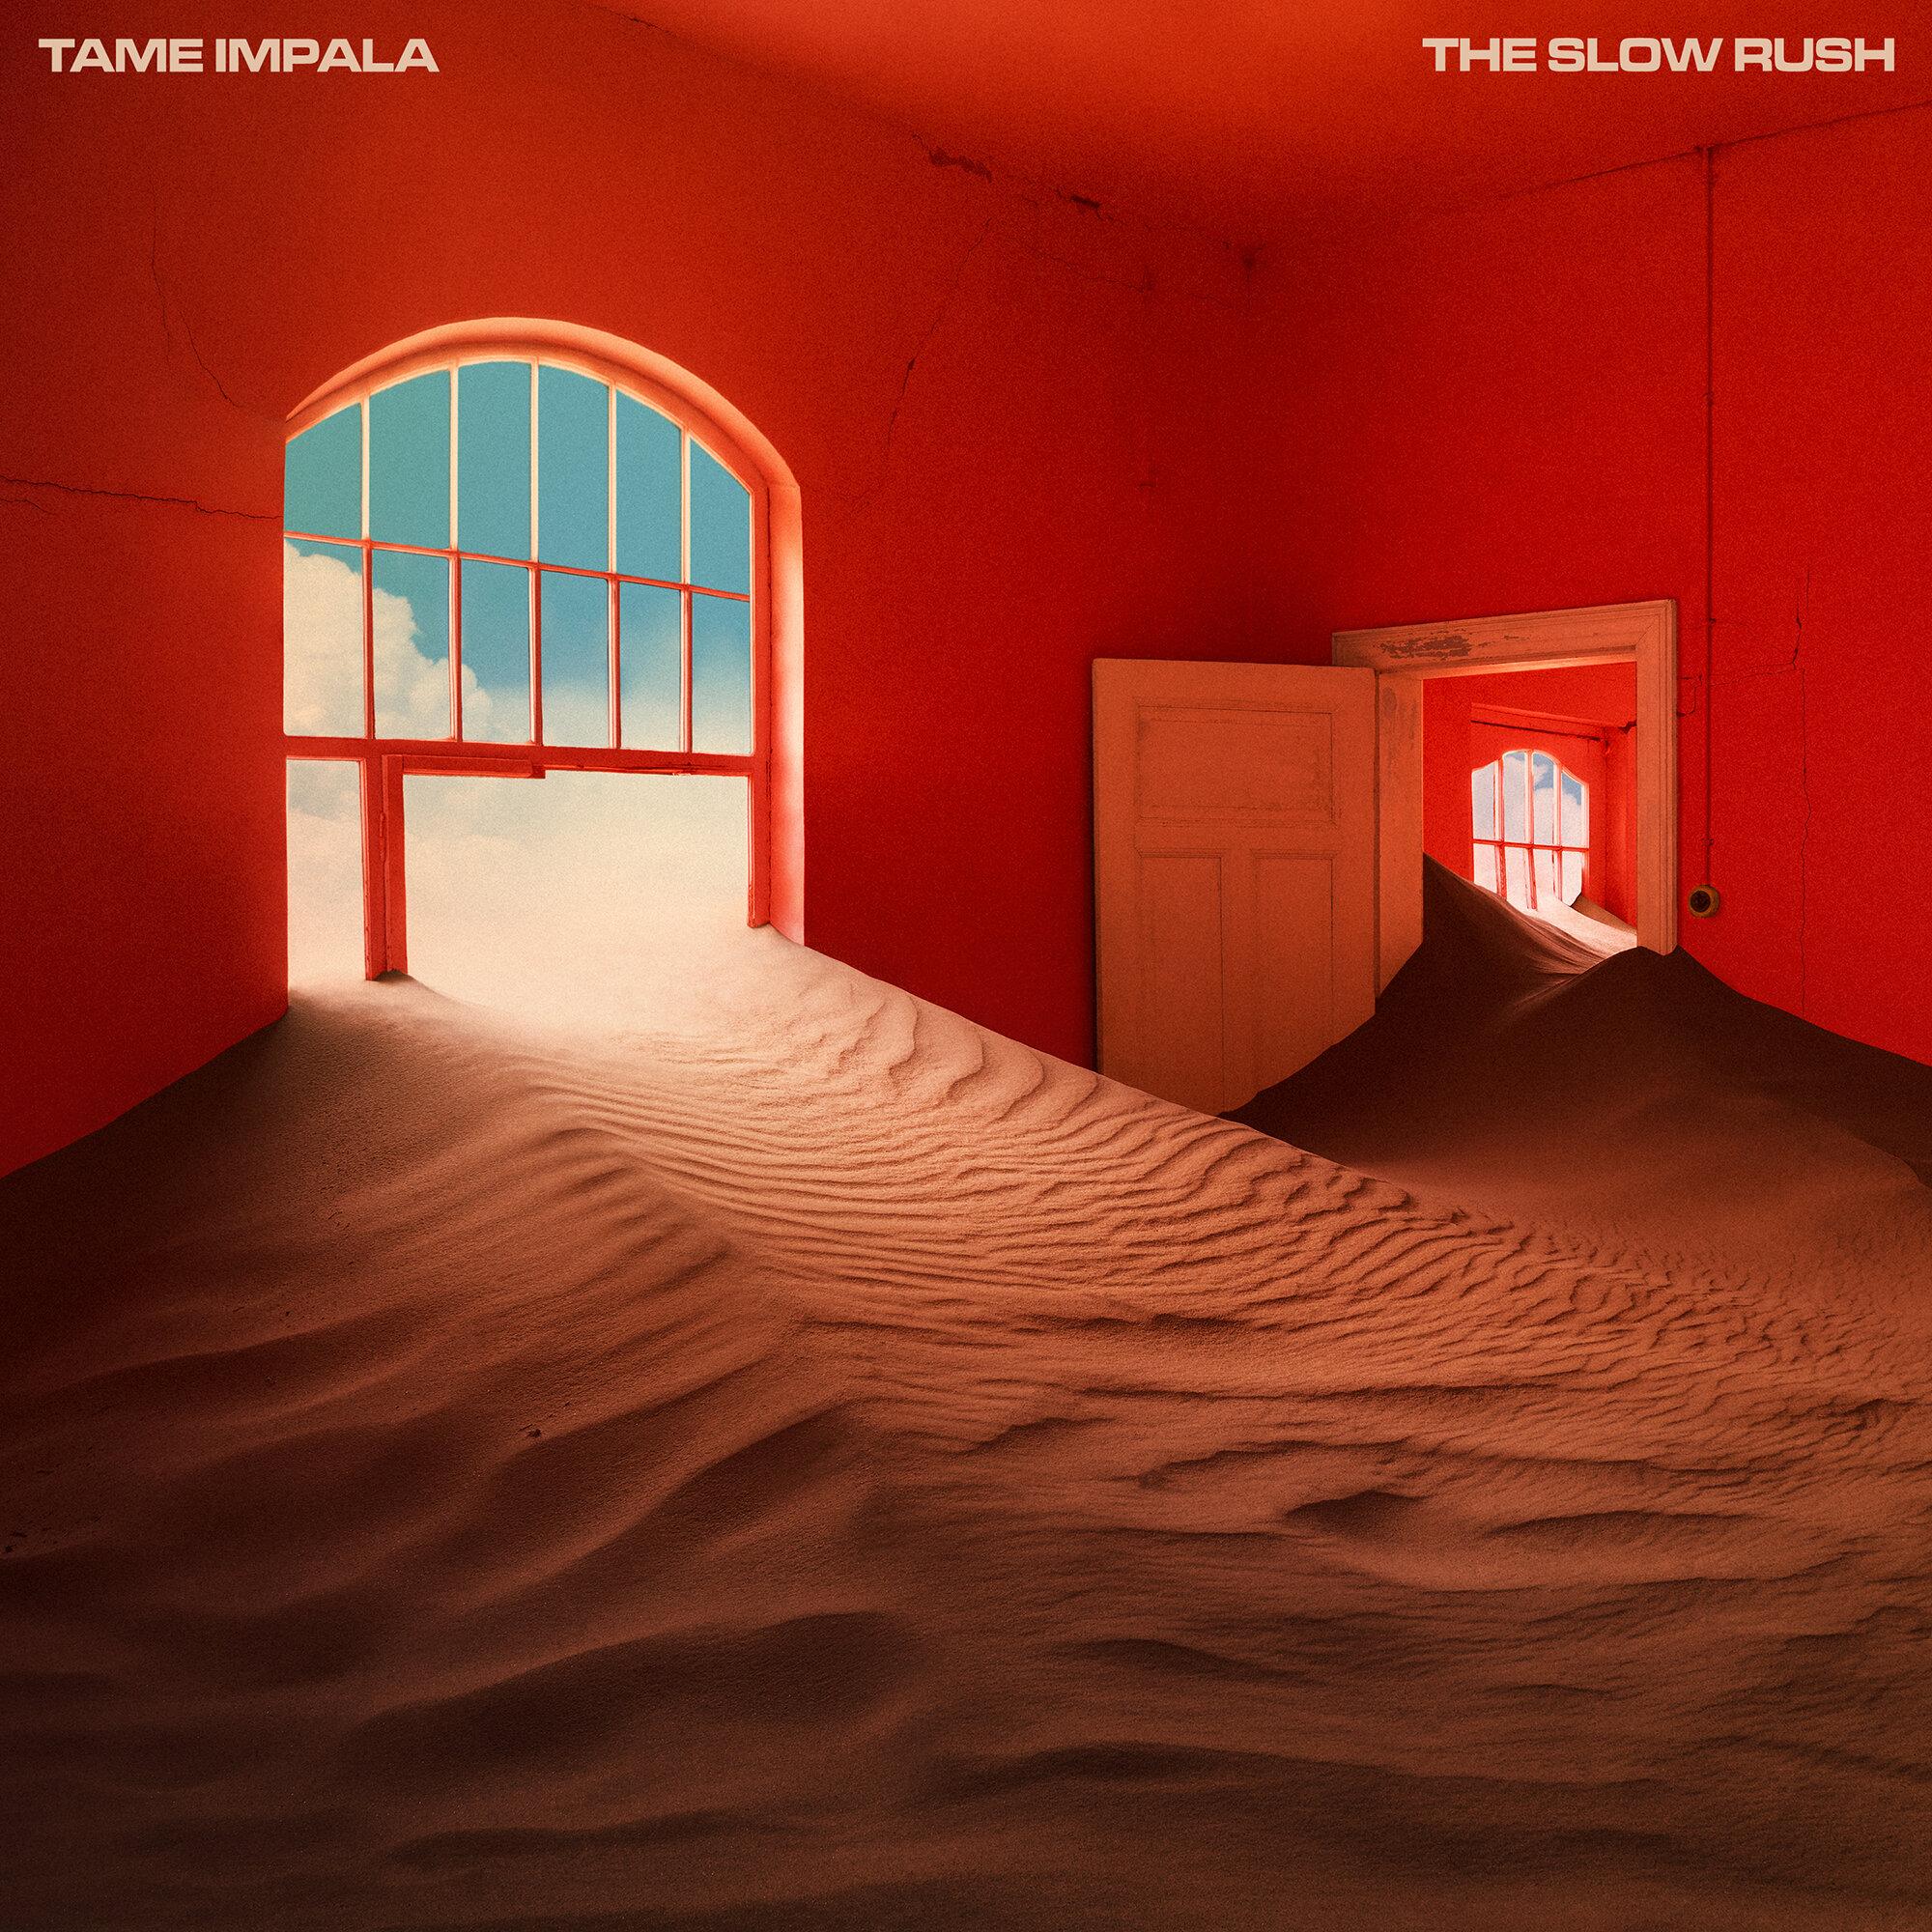 Tame Impala - The Slow Rush - Artwork - Neil Krug.jpg